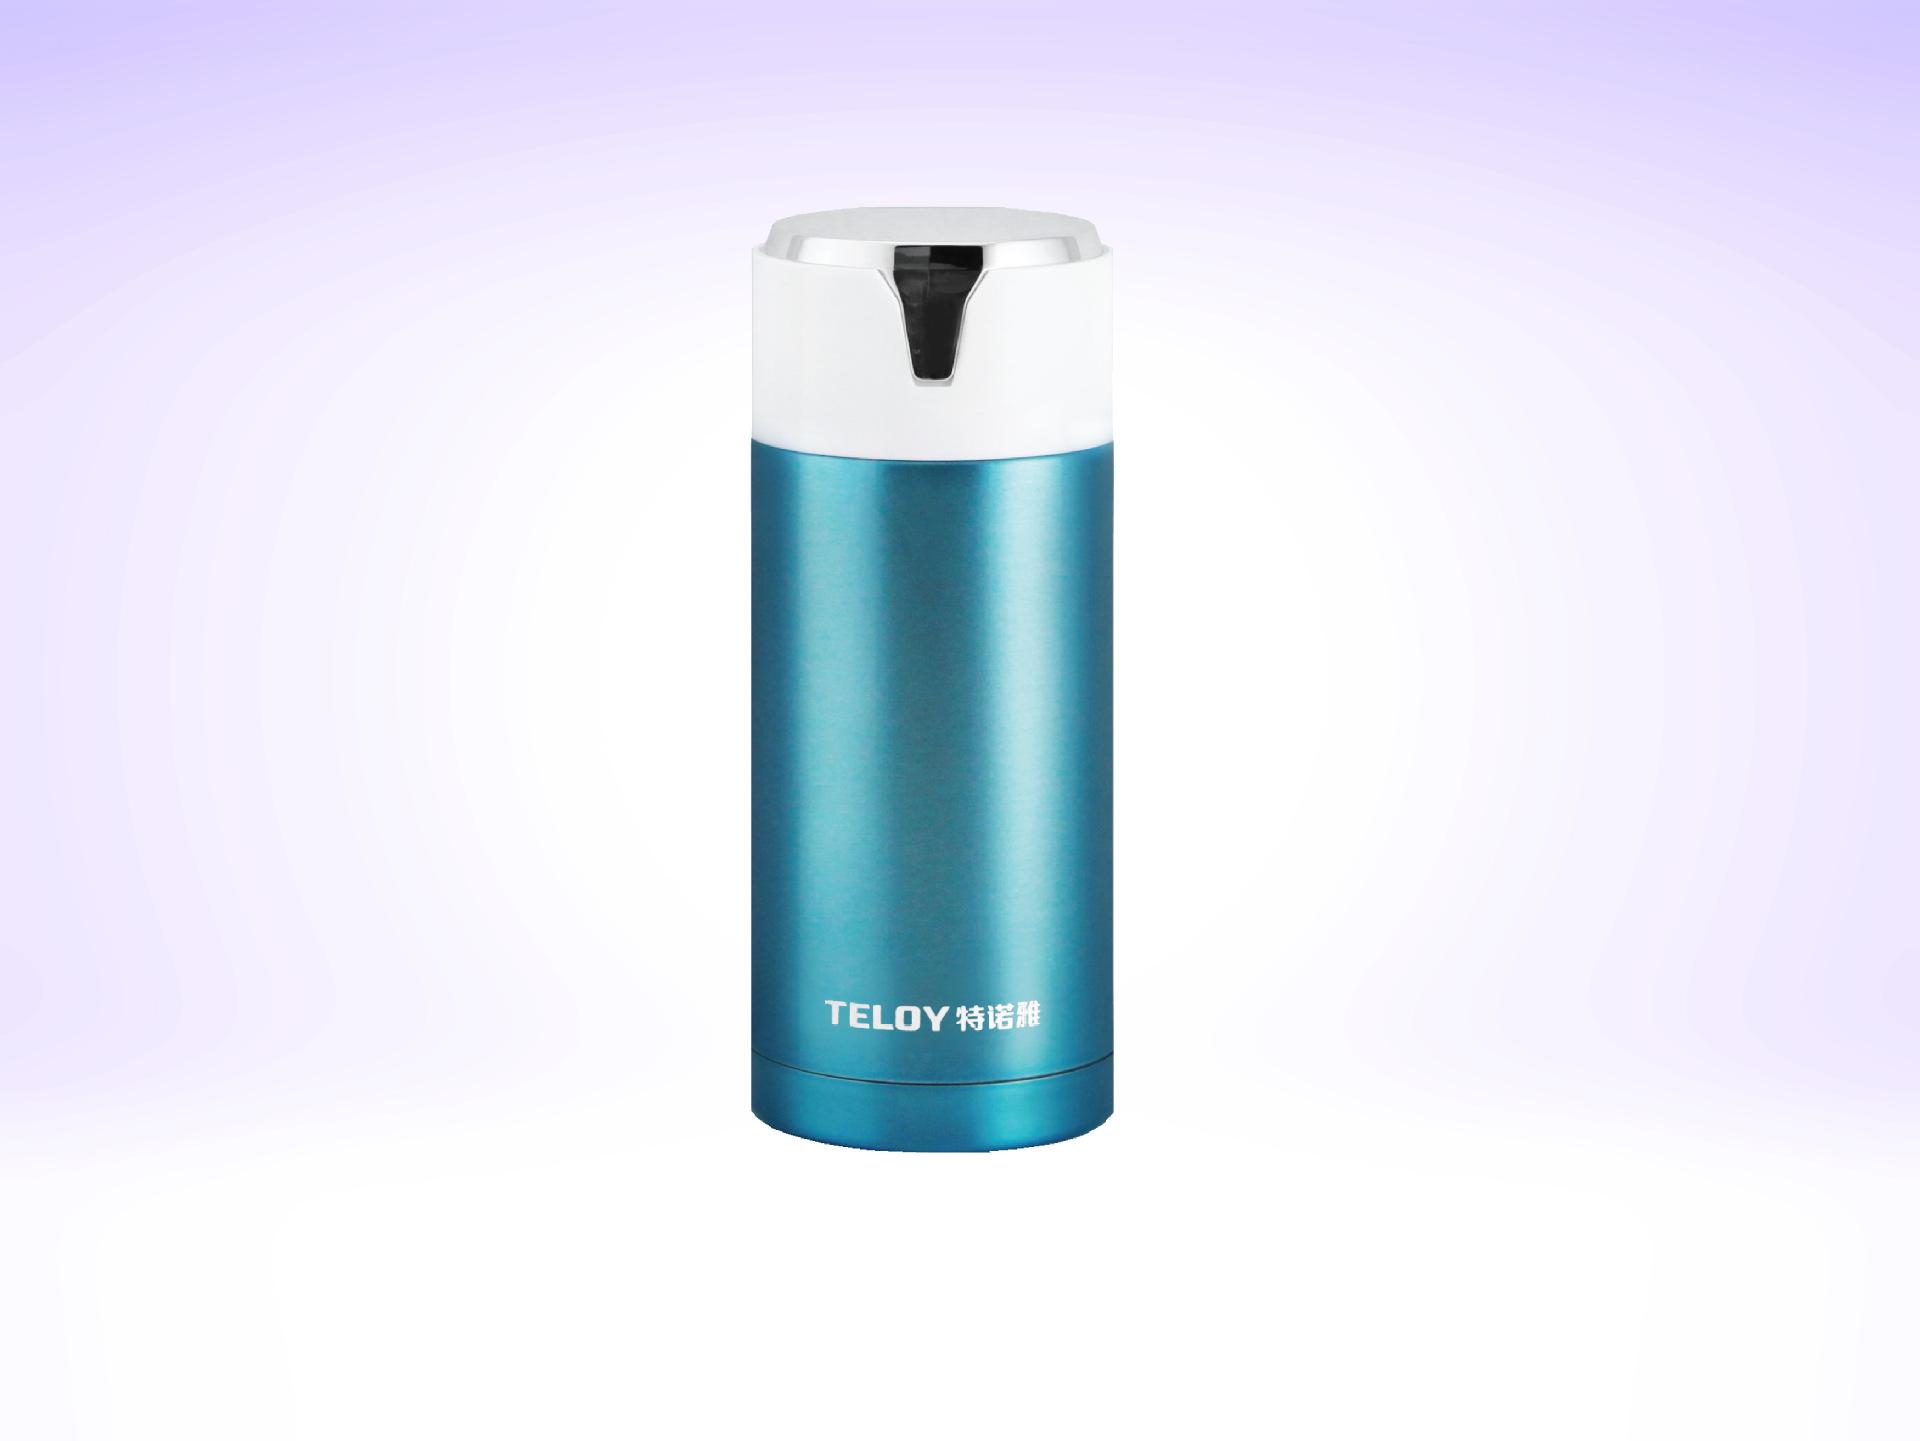 TELOY特诺雅 新款真空保温杯 优质不锈钢 王哲林代言D-50009-280